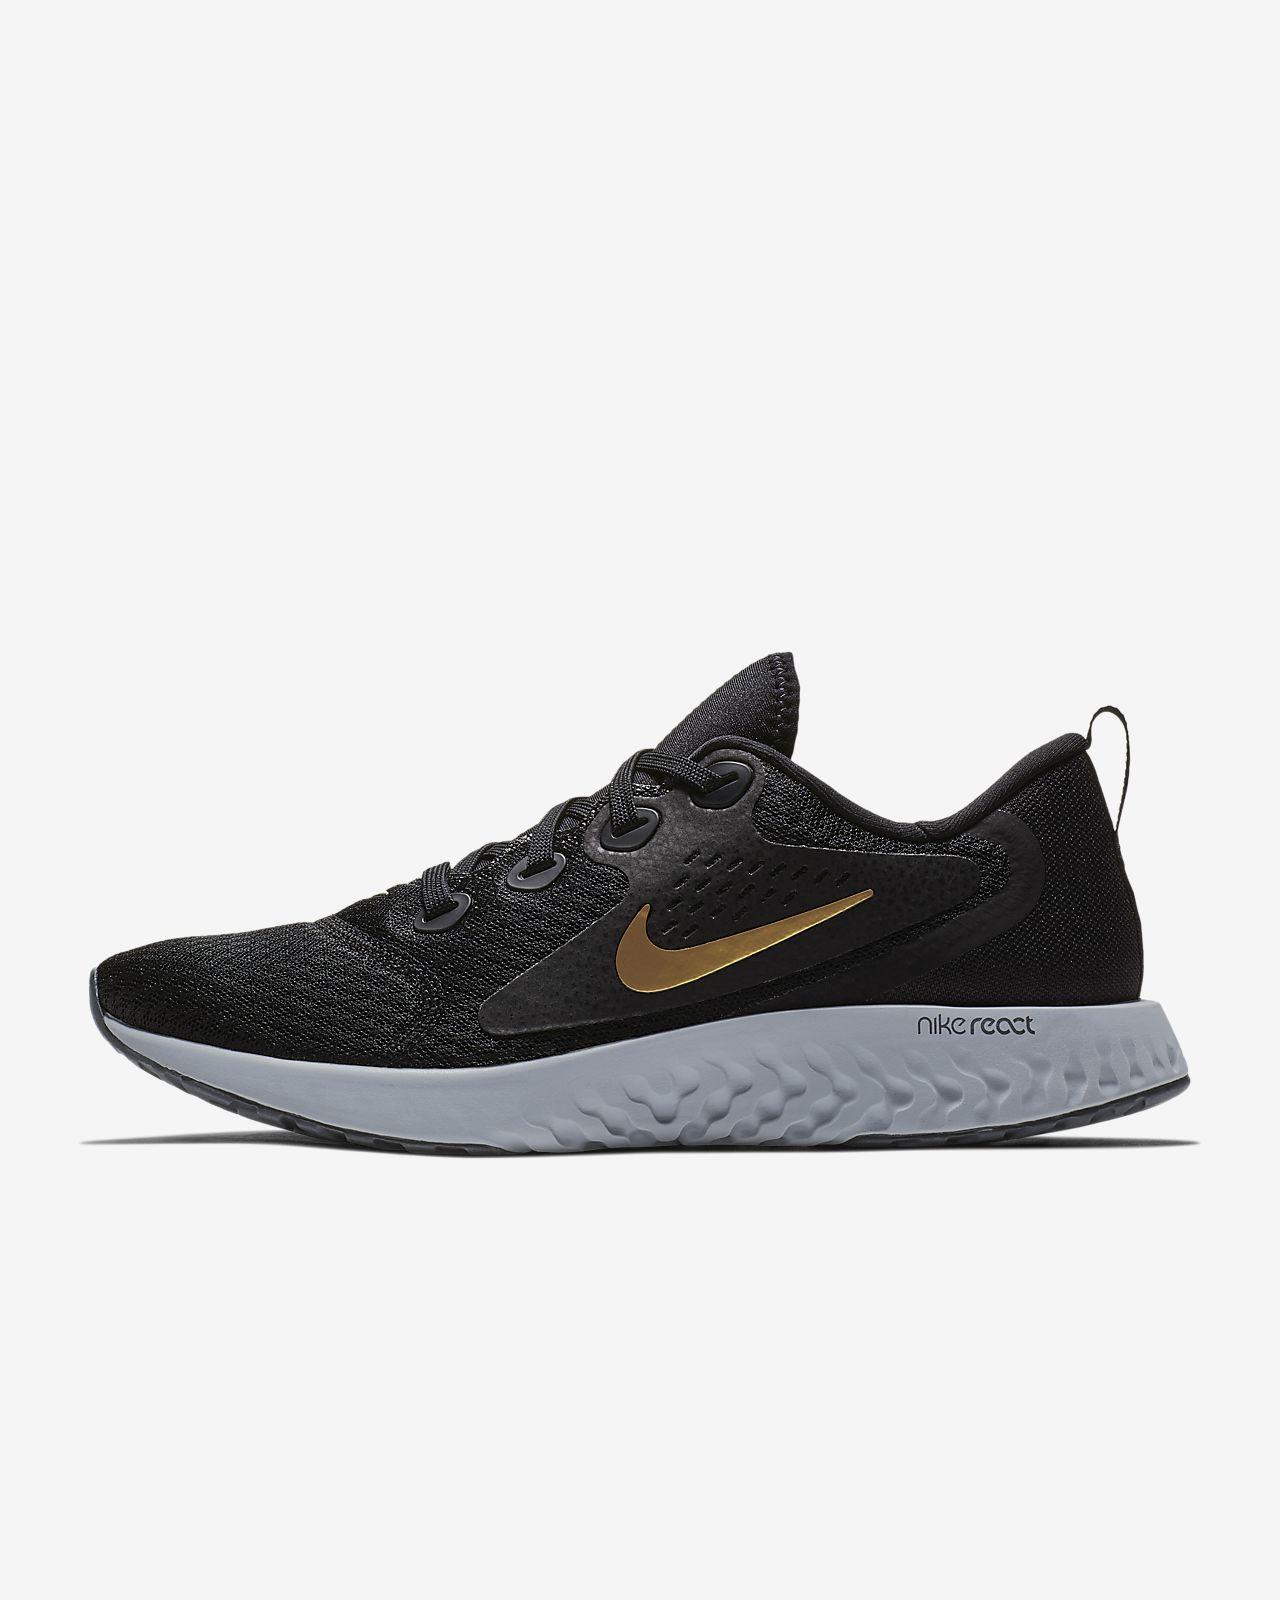 Dámská běžecká bota Nike Legend React